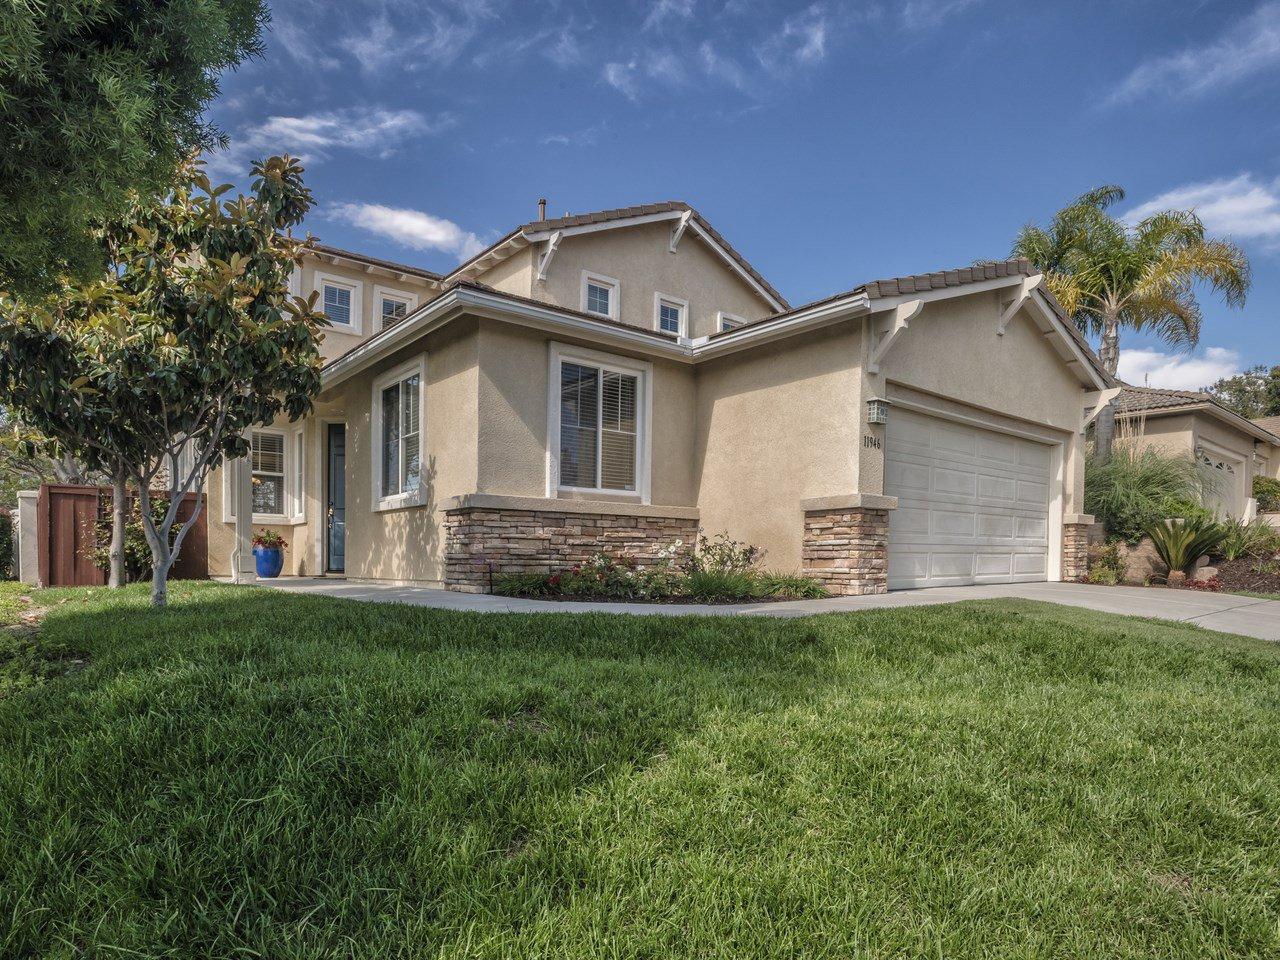 Main Photo: SCRIPPS RANCH House for sale : 4 bedrooms : 11946 Zirbel Ct in San Diego